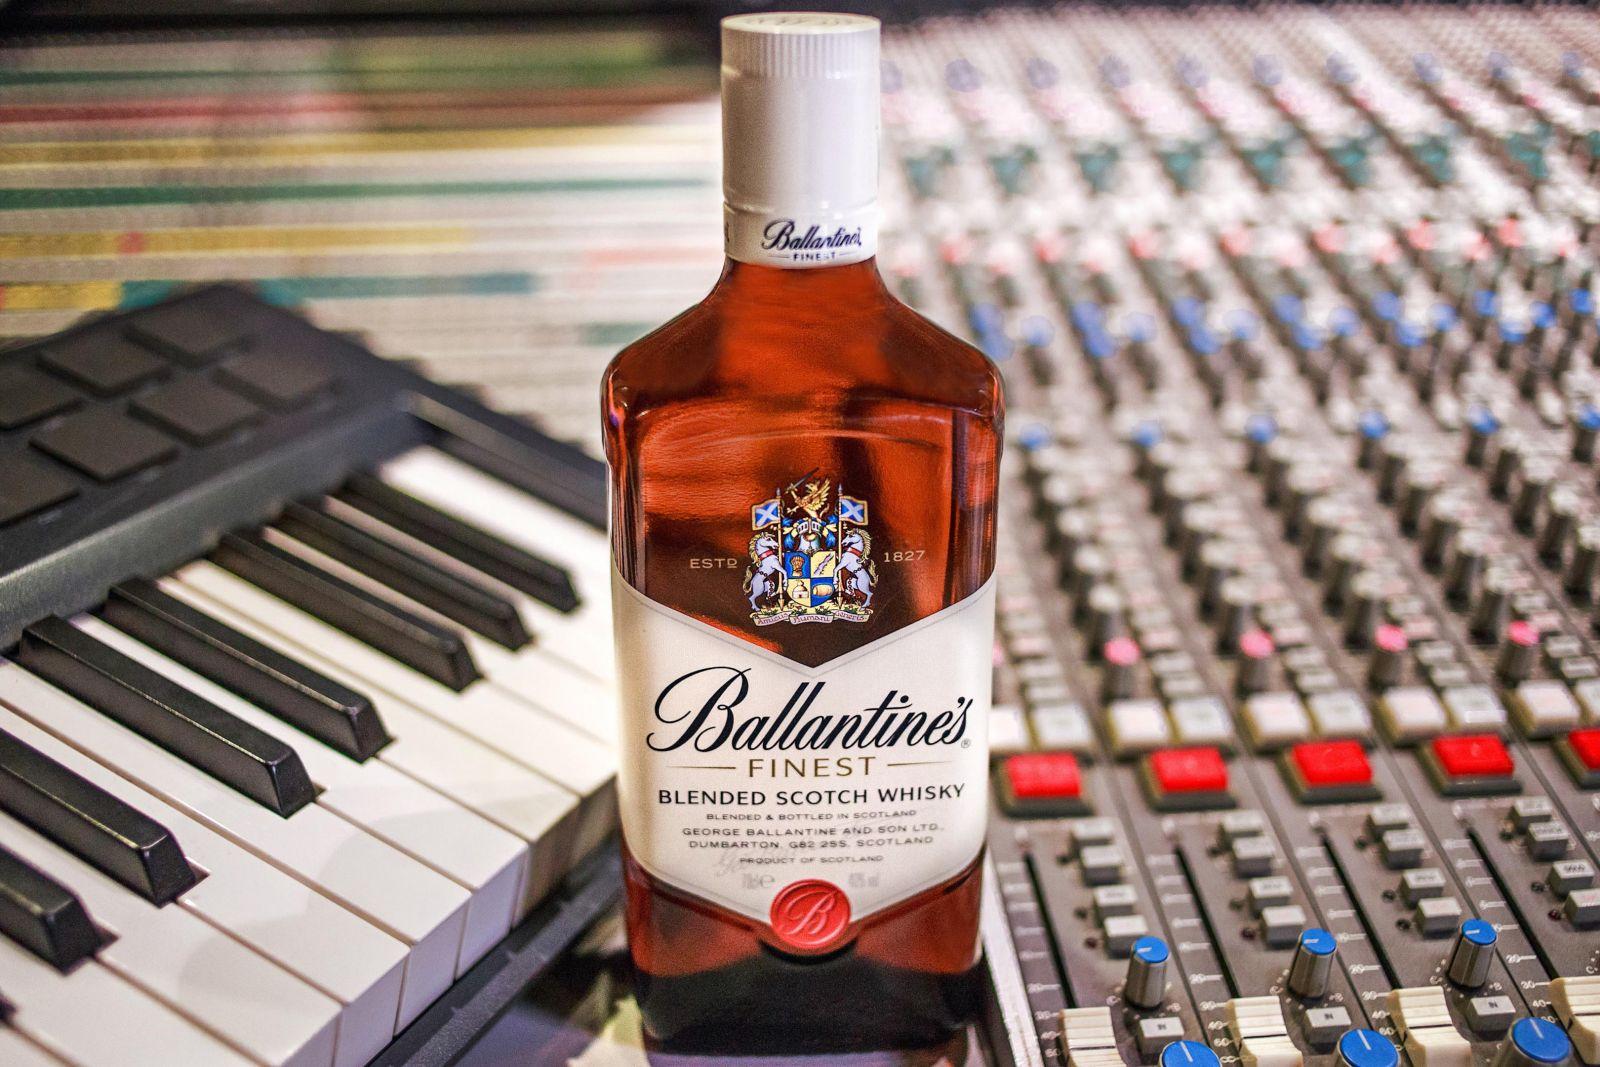 Не знаете где можно приобрести бутылку виски Баллантайнс дешево?